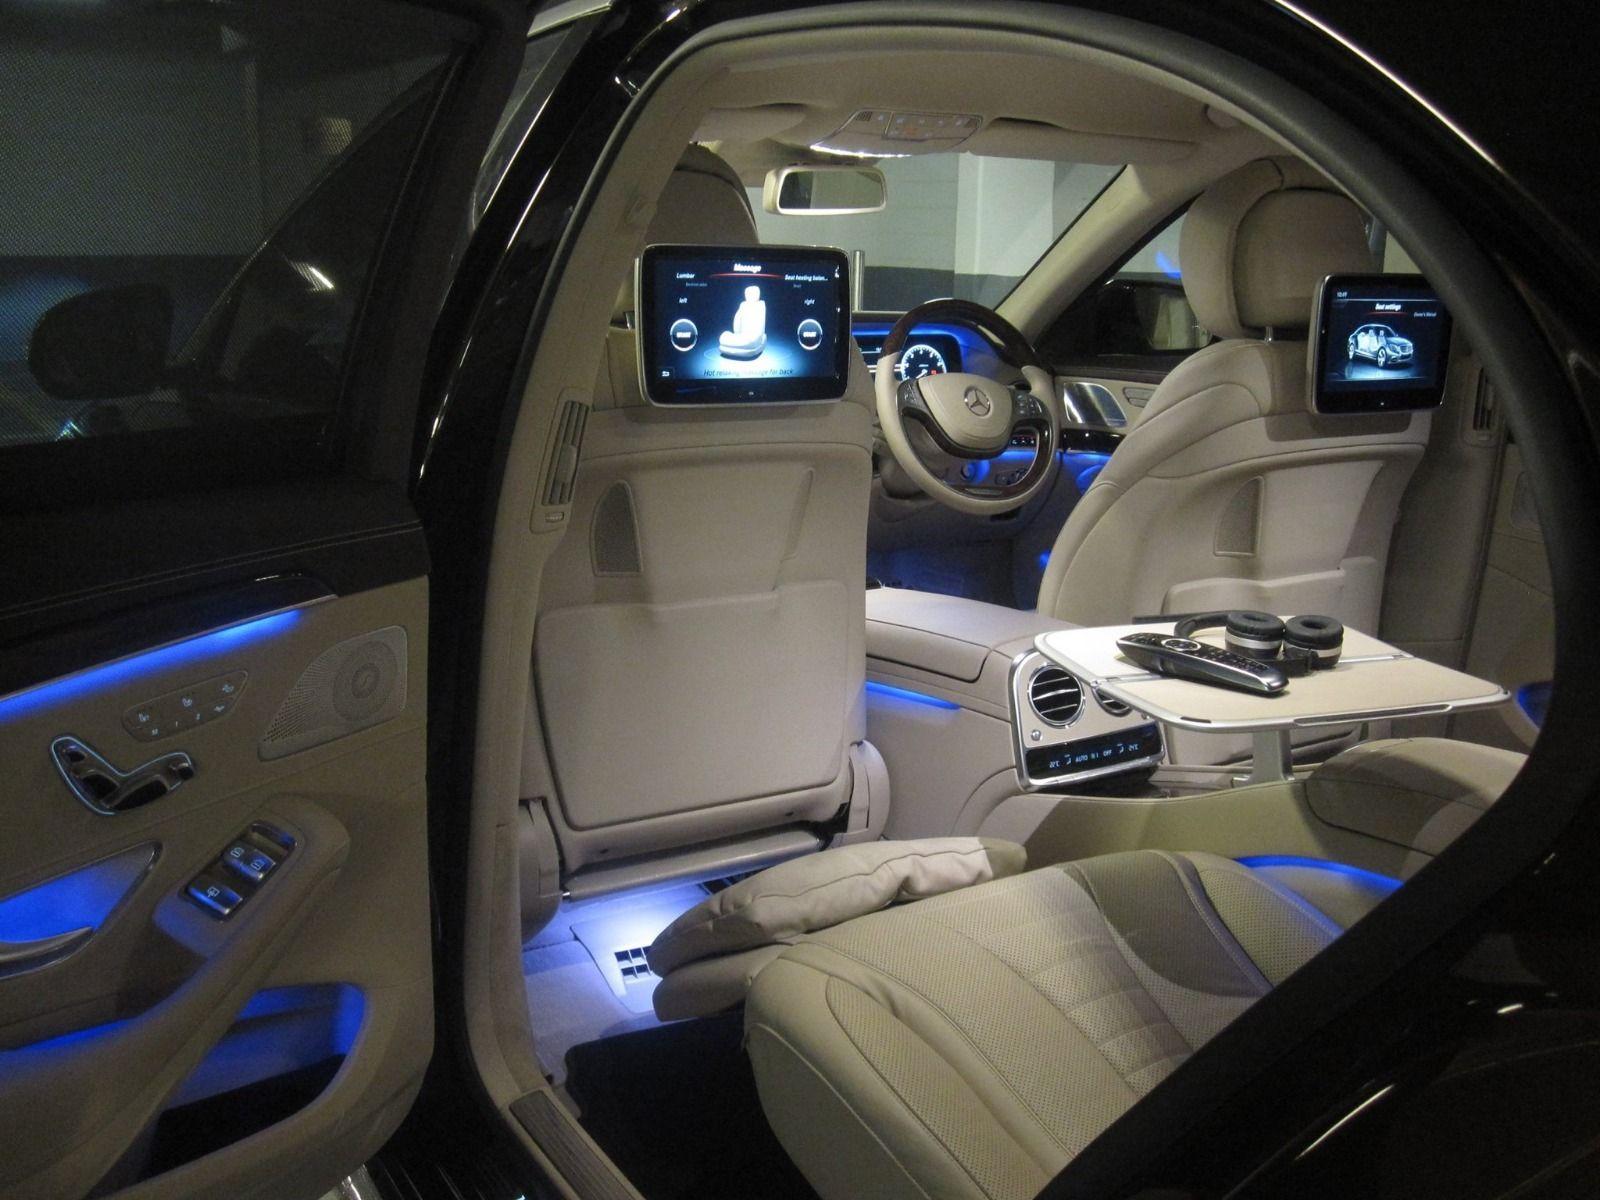 Luxury Chauffeur Services In 2020 Chauffeur Service Chauffeur Luxury Cars